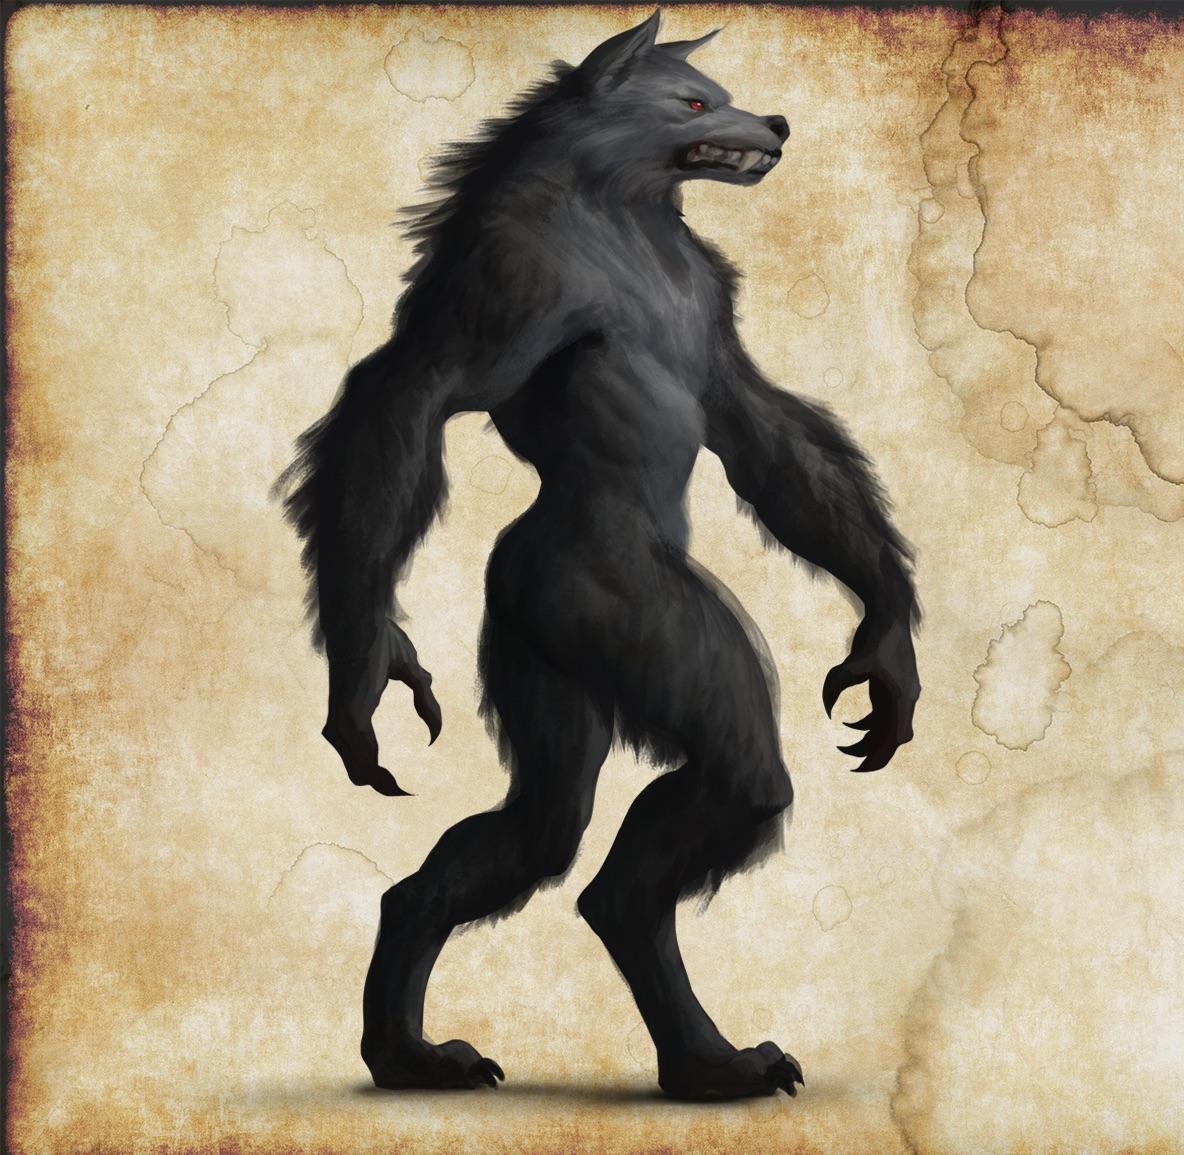 nightwolf-lg.jpg